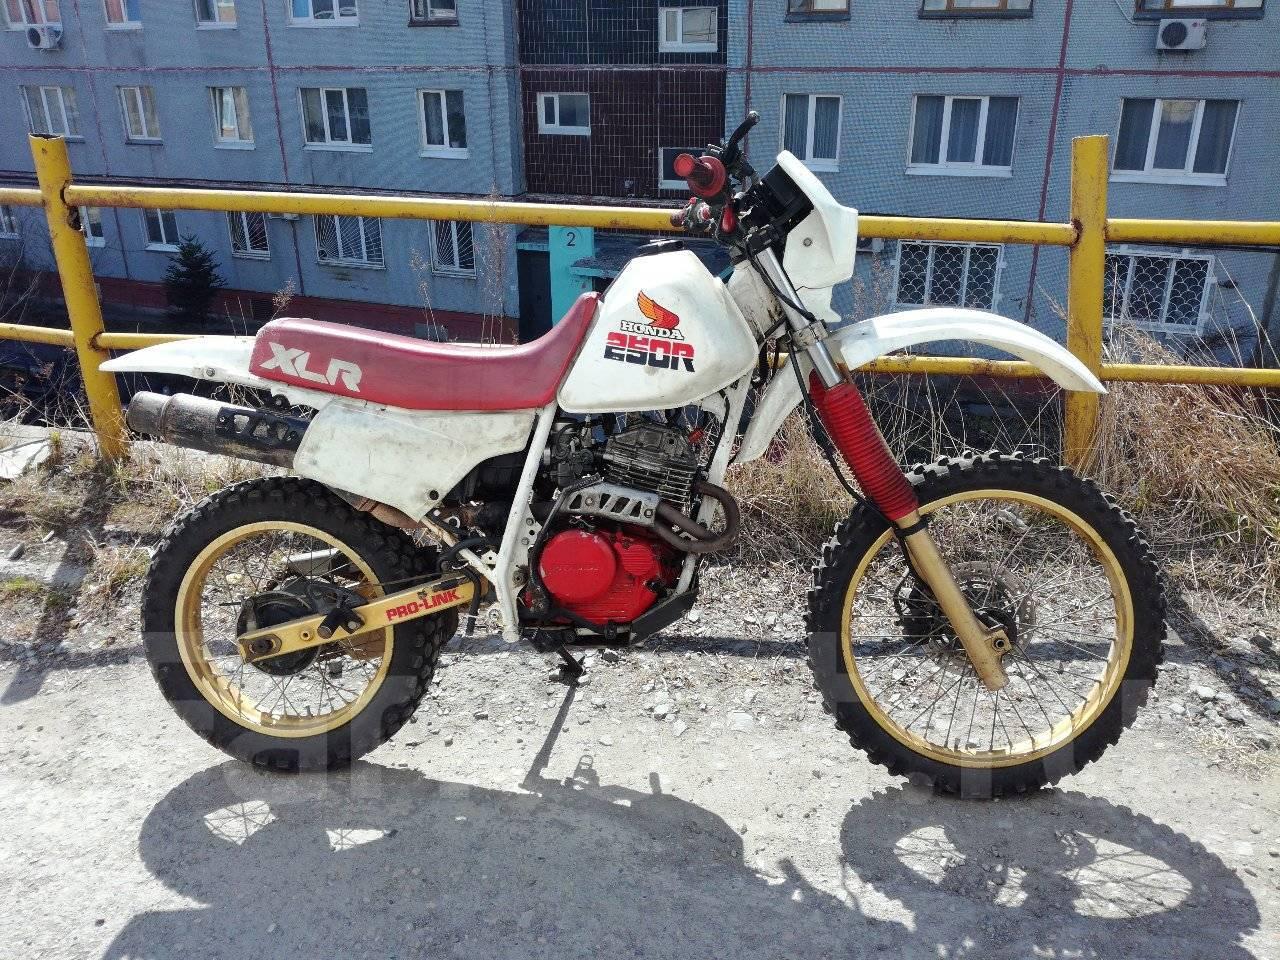 инструкция по зксплуатации мотоцикла хонда сб 1300